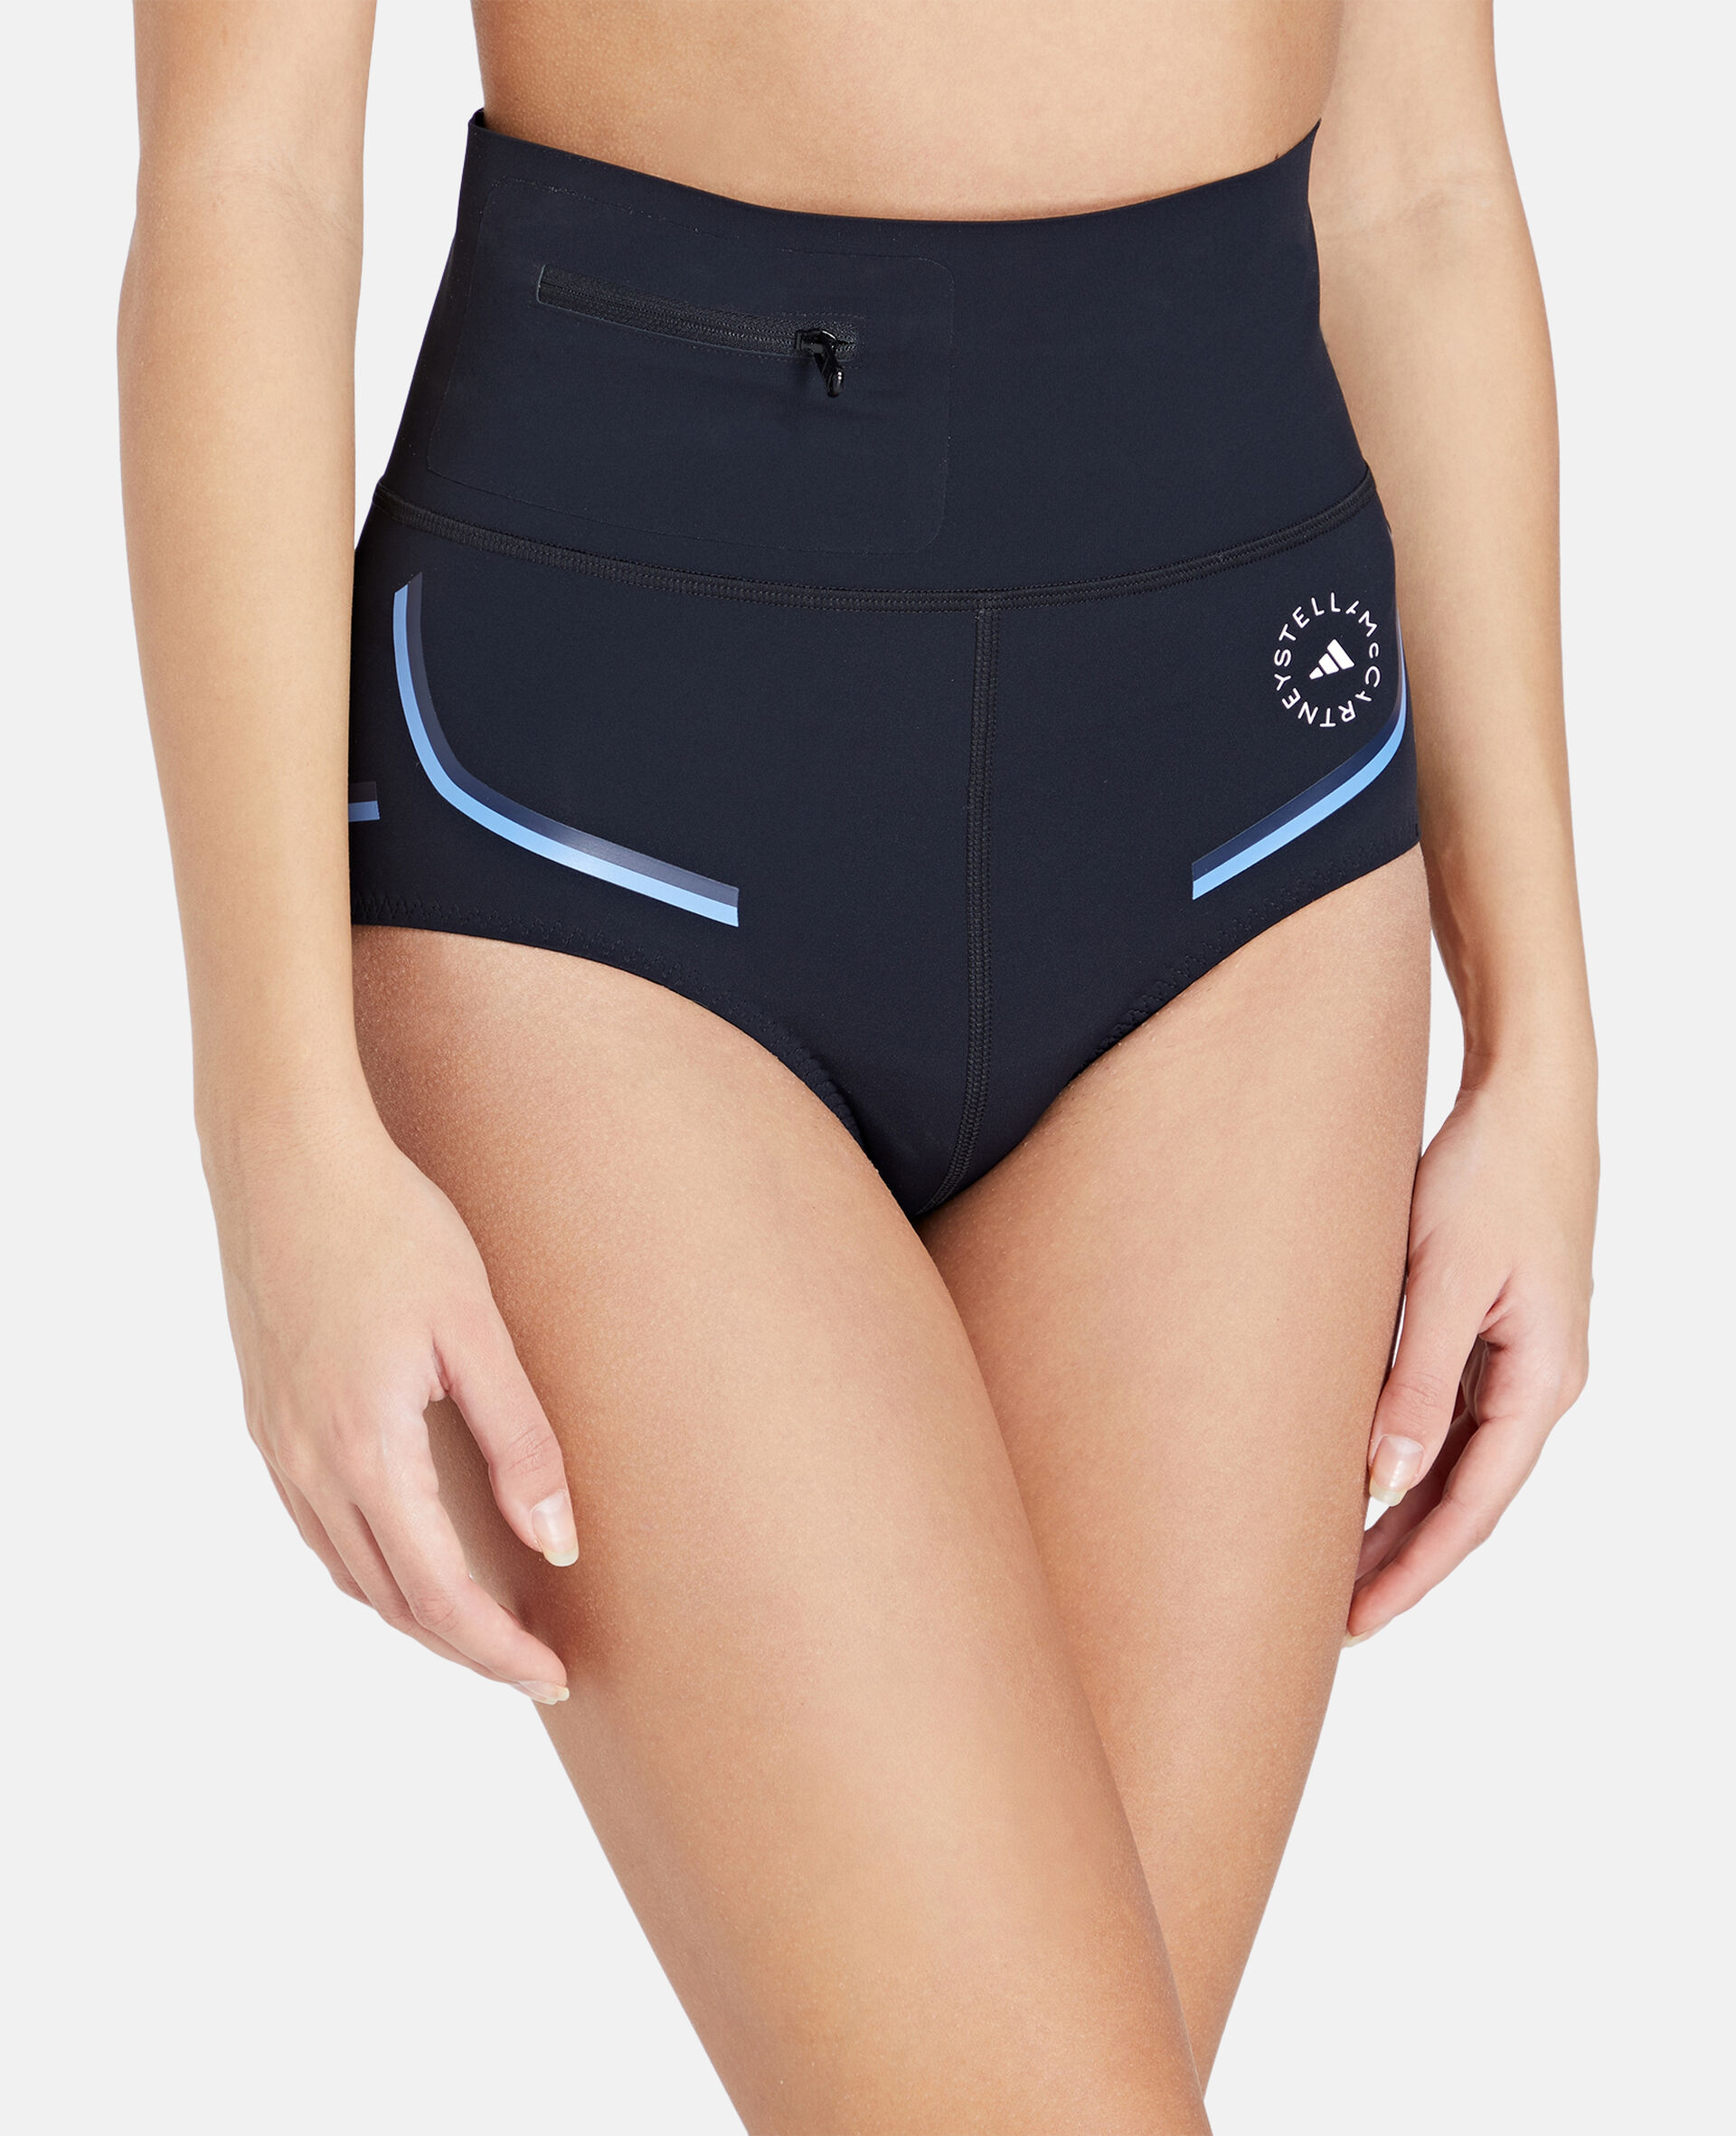 Black Beach Defender Bikini Shorts-Black-large image number 3